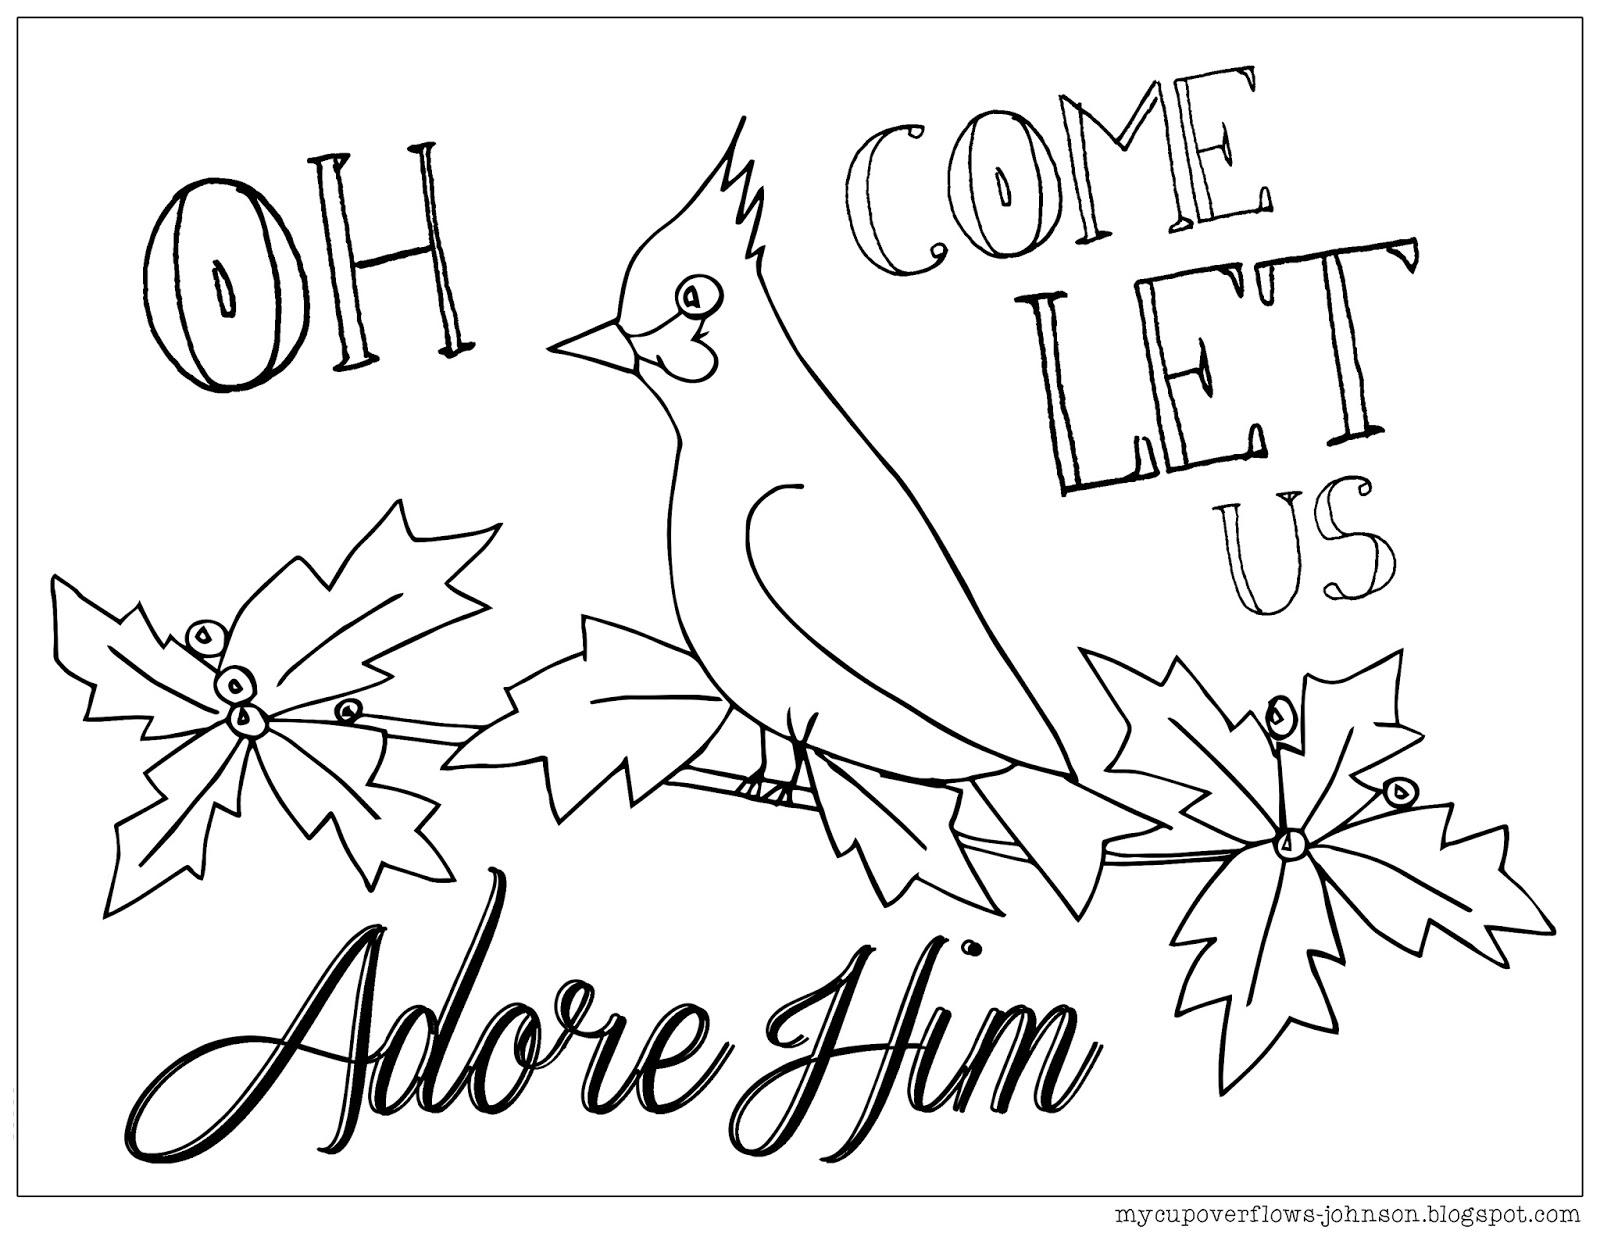 Coloring Page Christmas Coloring Page Christmas Bible | PicGifs.com | 1237x1600